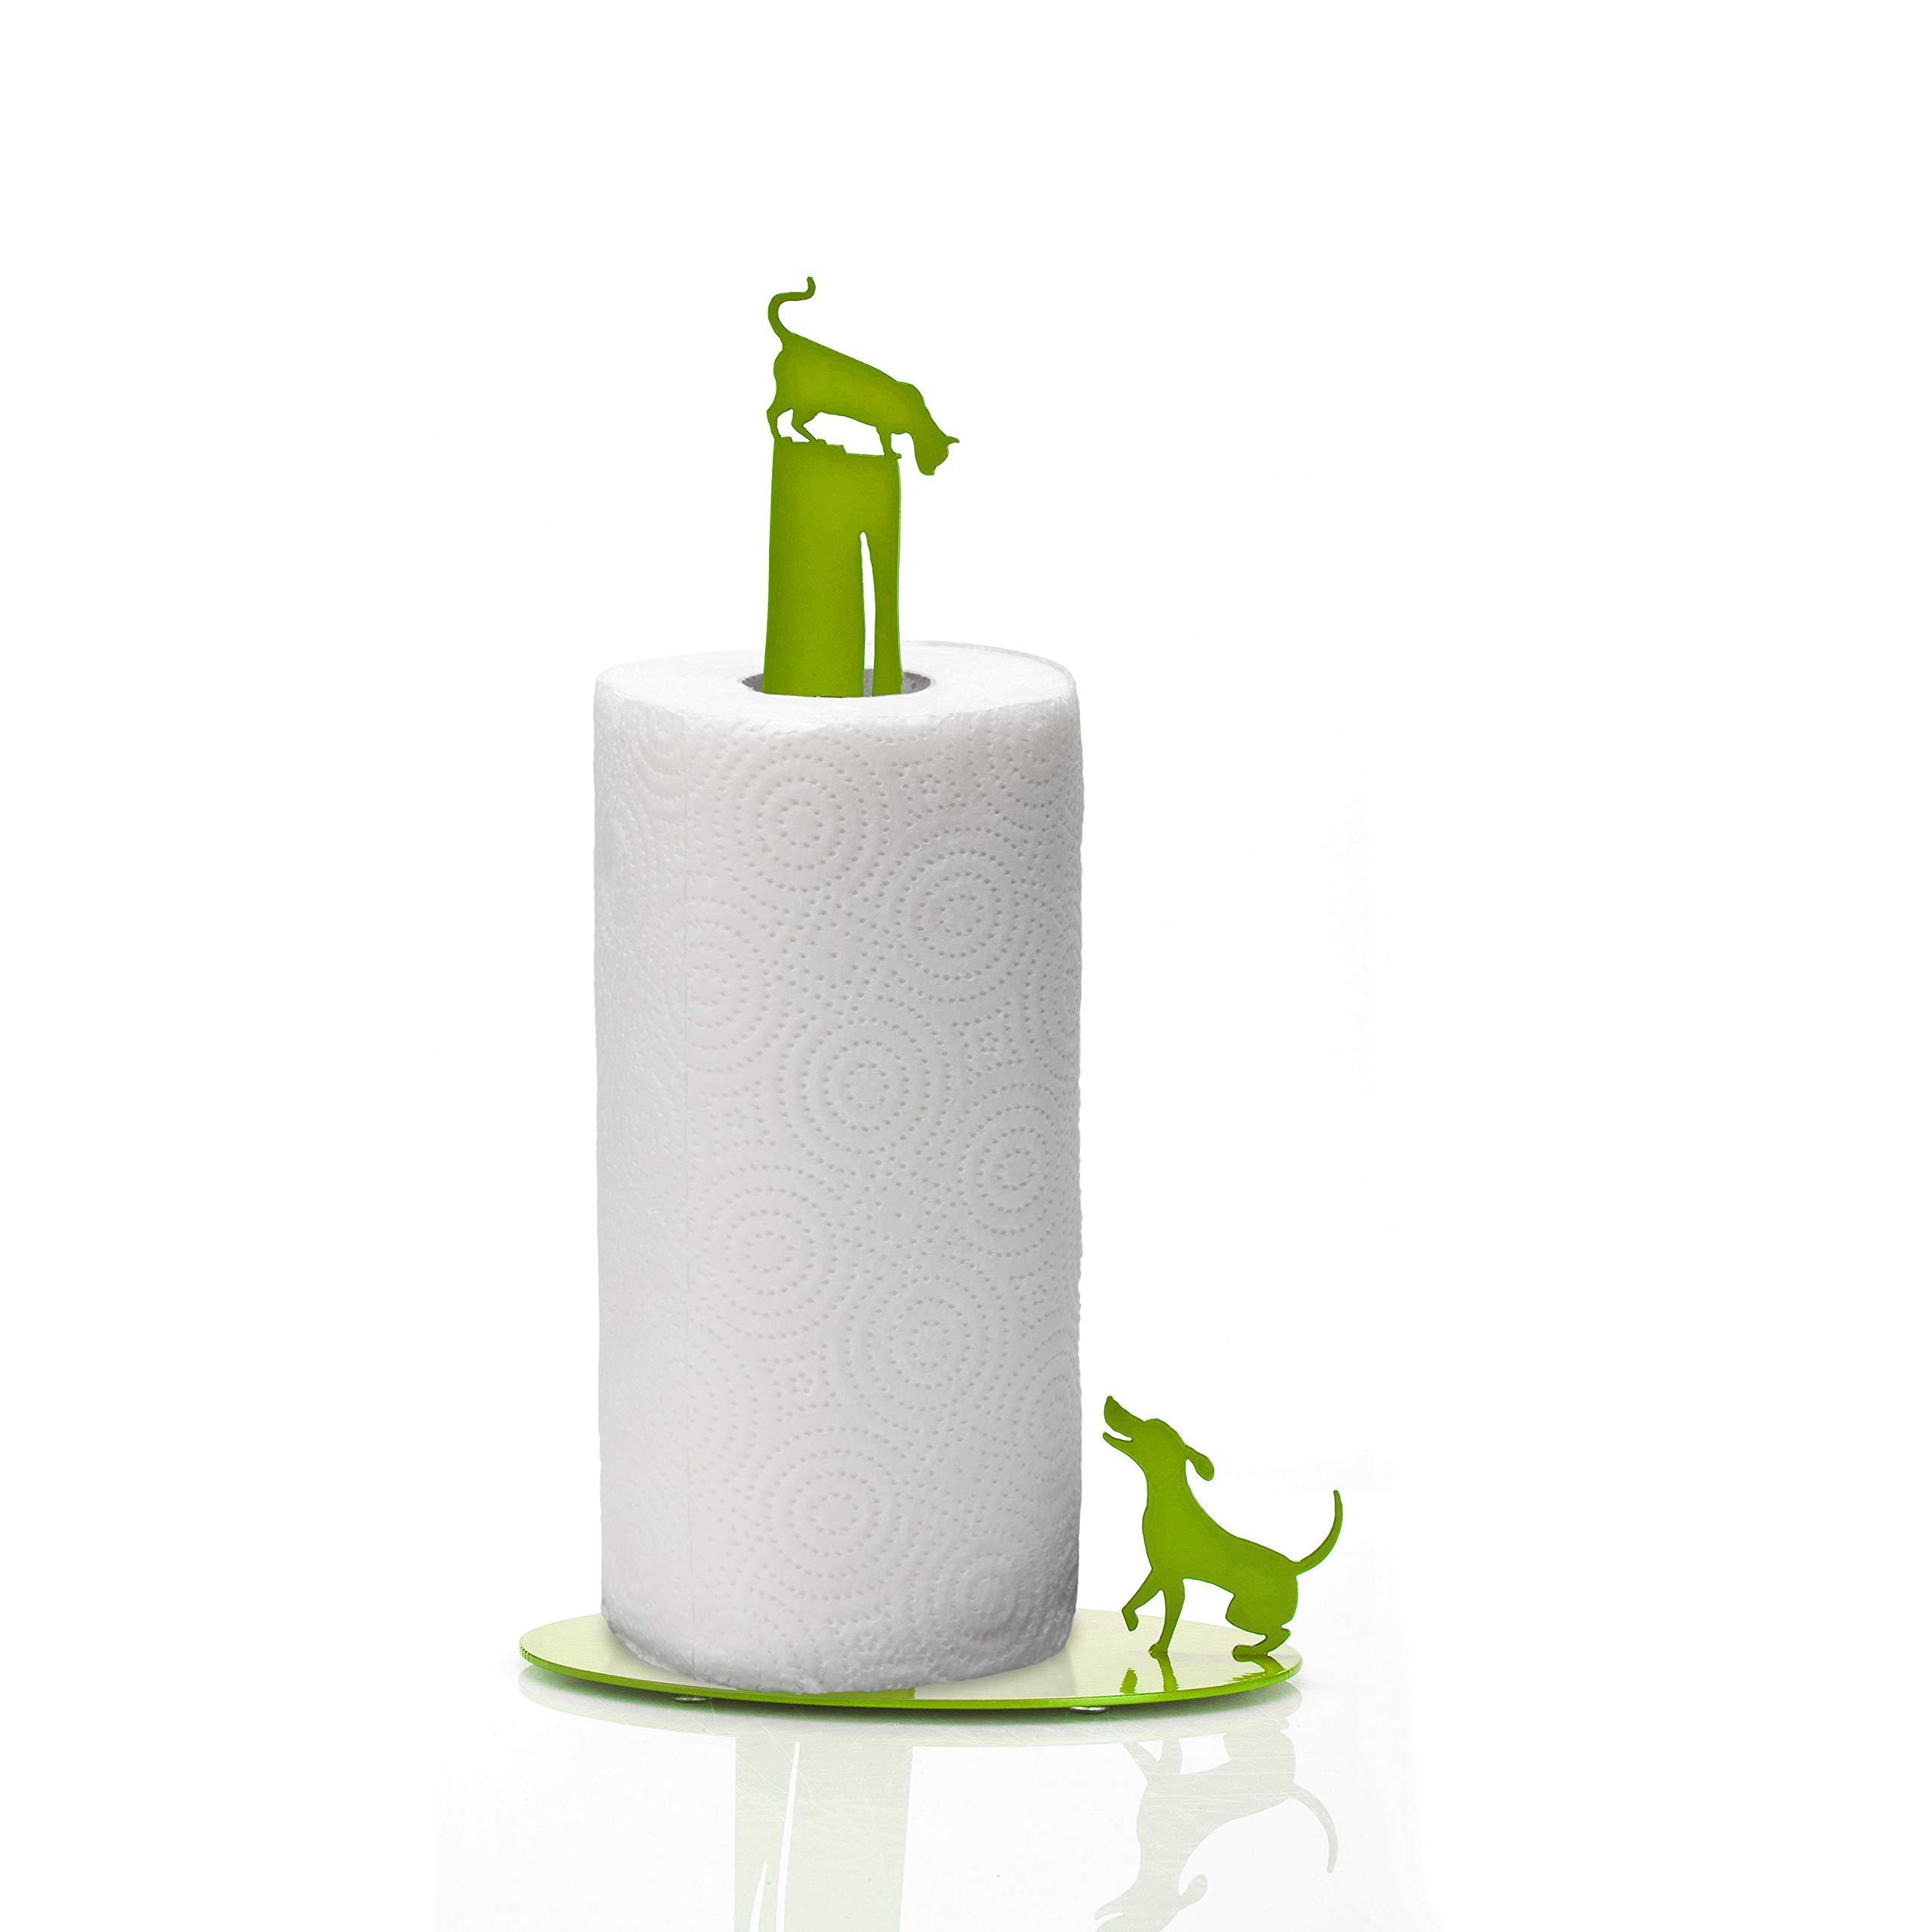 Artori Design Dog vs Cat | Paper Towel Stand Holder | Cute Design Rack| Perfect Gift